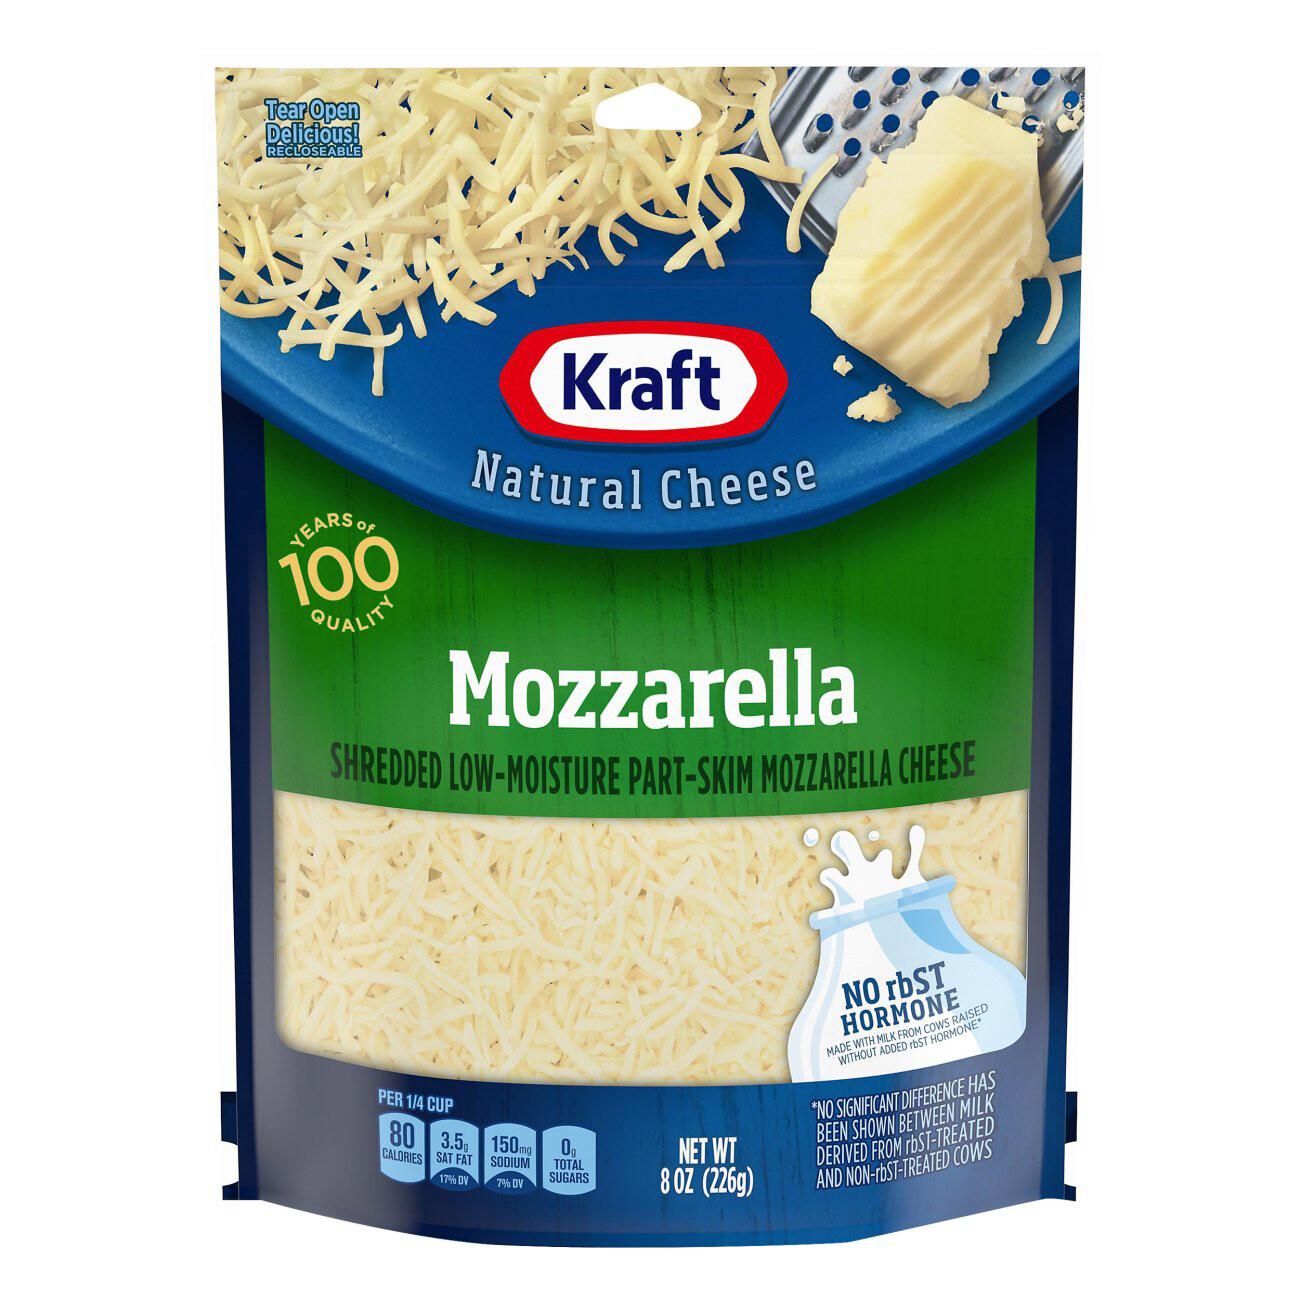 MOZZARELLA CHESSE NATURAL CHEESE KRAFT 226g